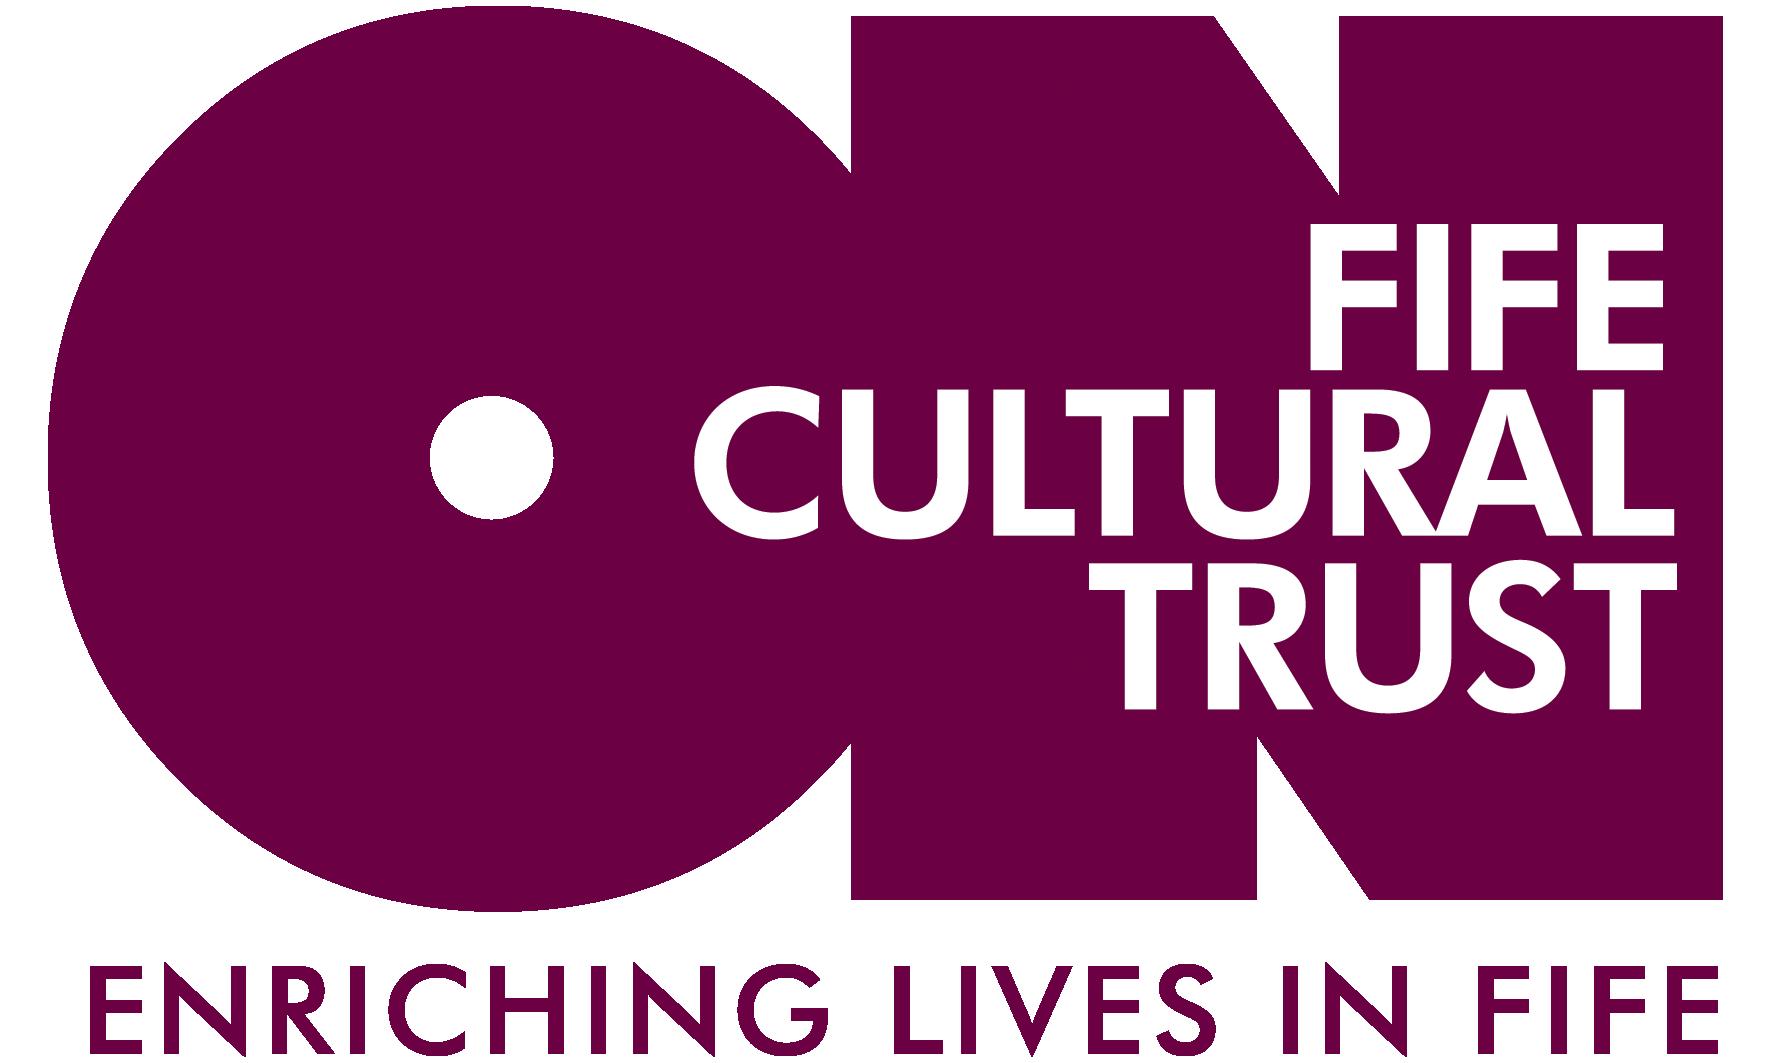 Fife Cultural Trust, Scotland